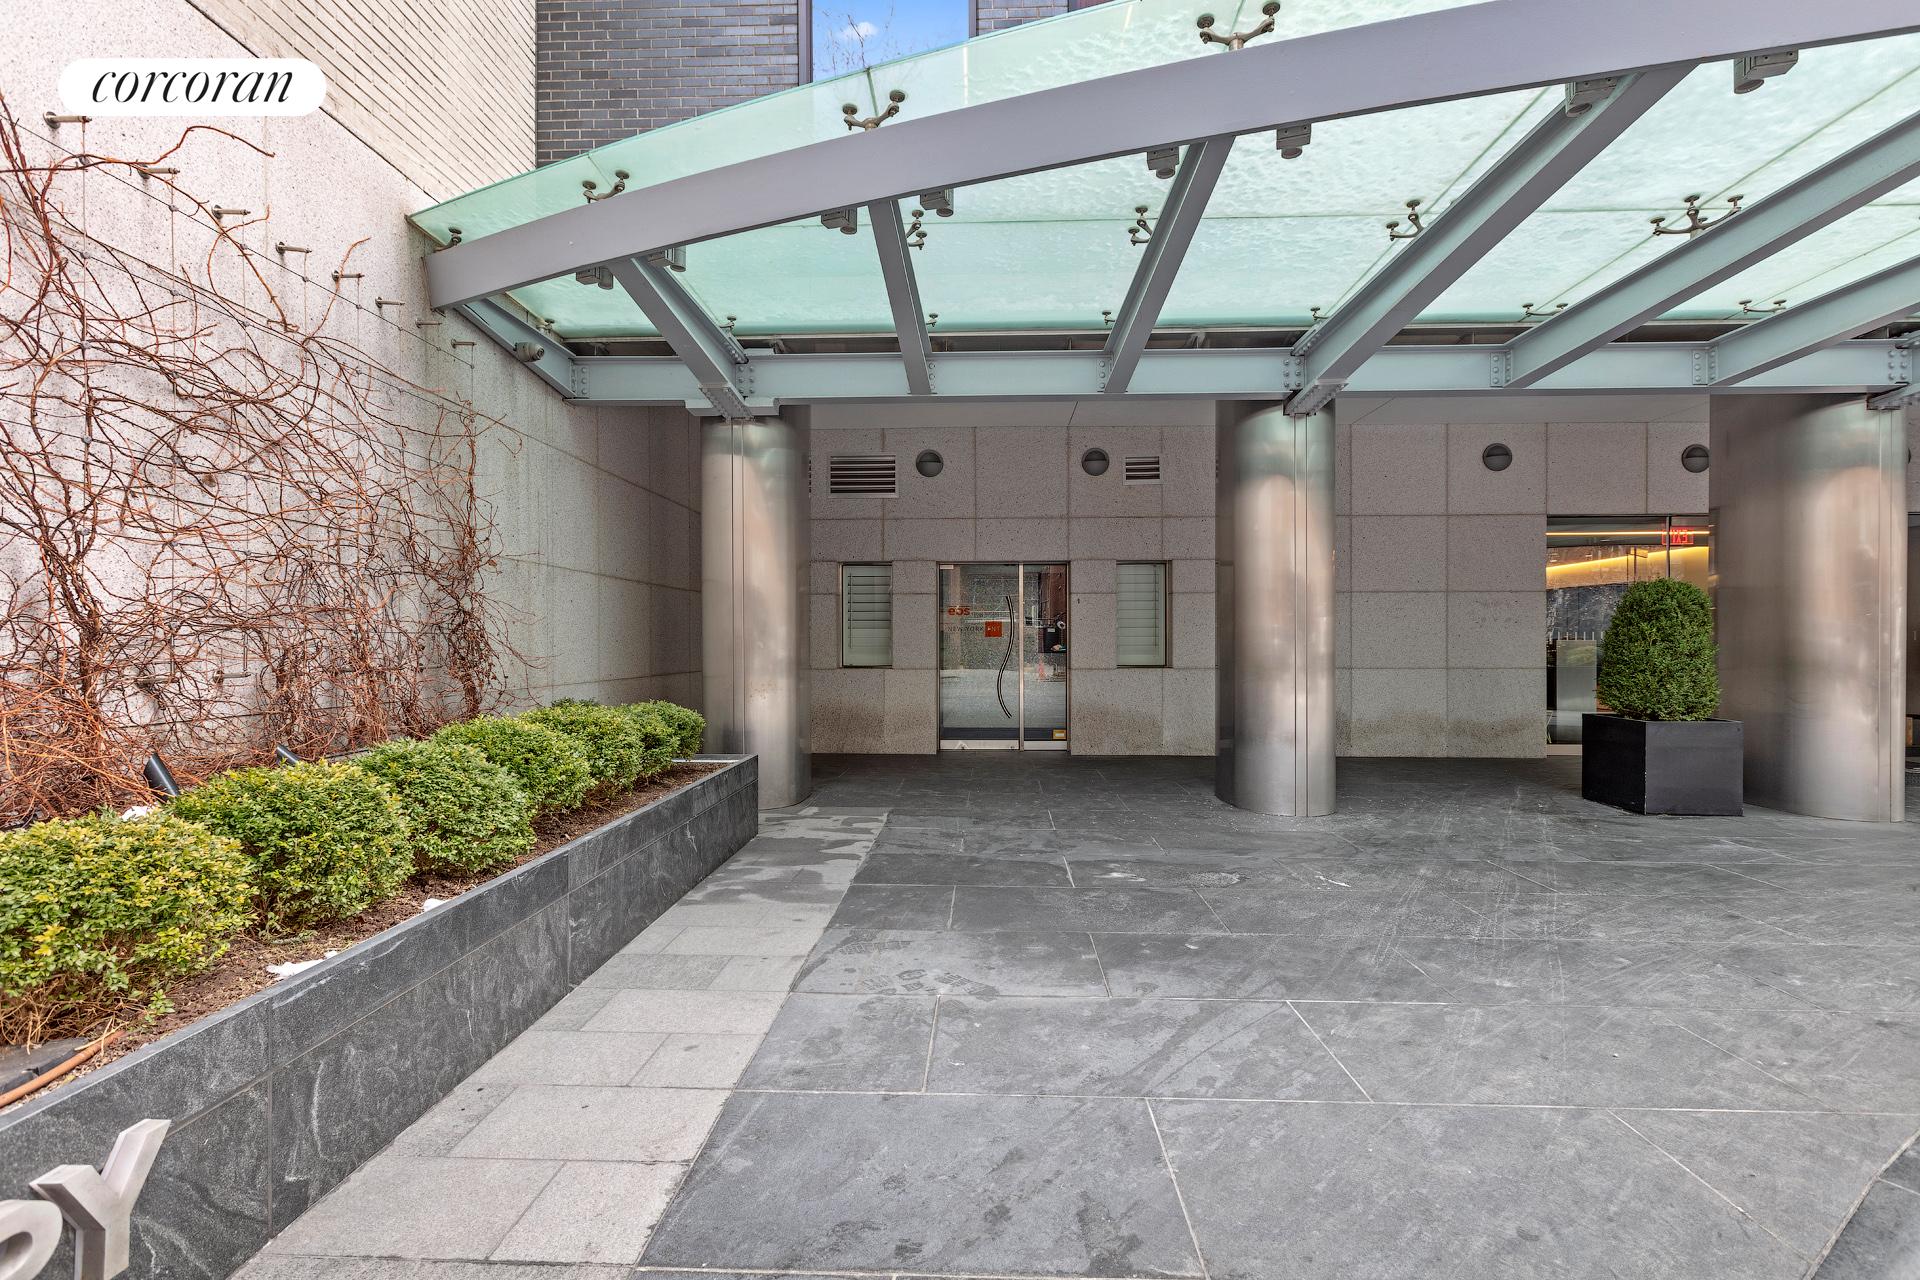 200 East 62nd Street, Apt GF, Manhattan, New York 10065